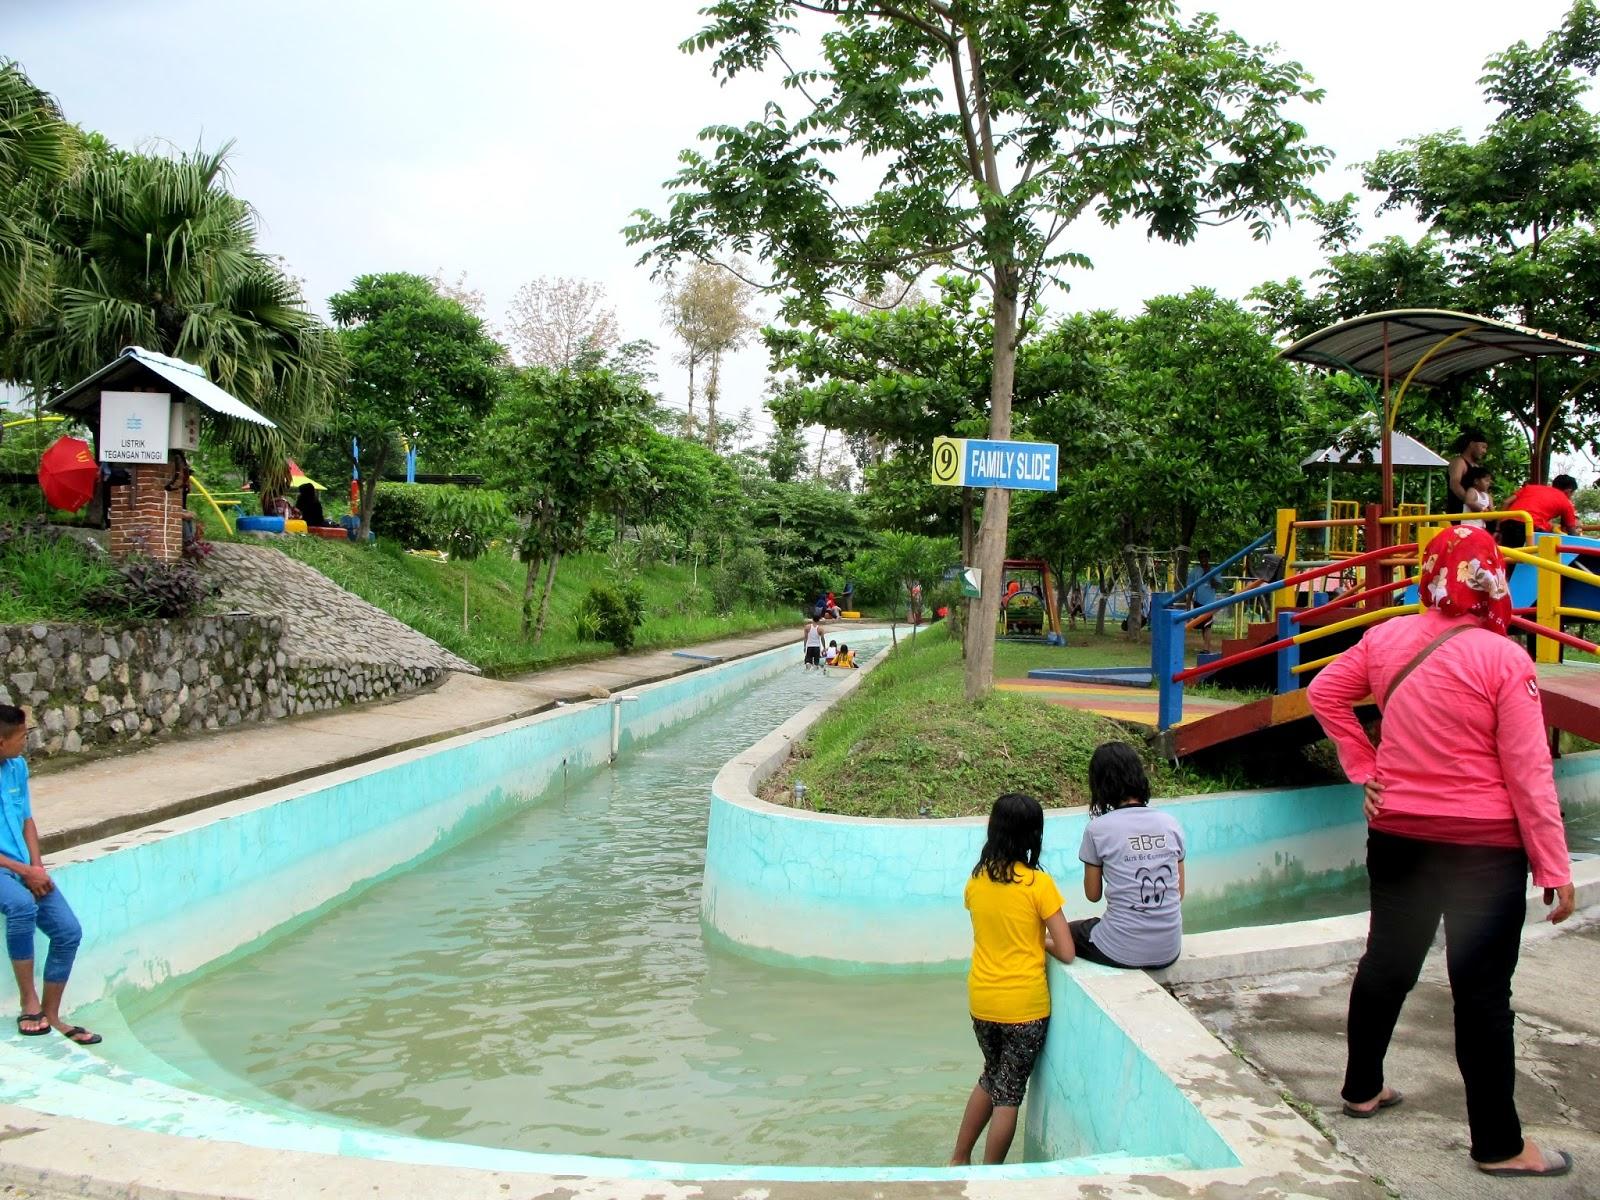 Wisata Joglo Park Pacet Haya Zone Perahu Kayuh Air Jungle